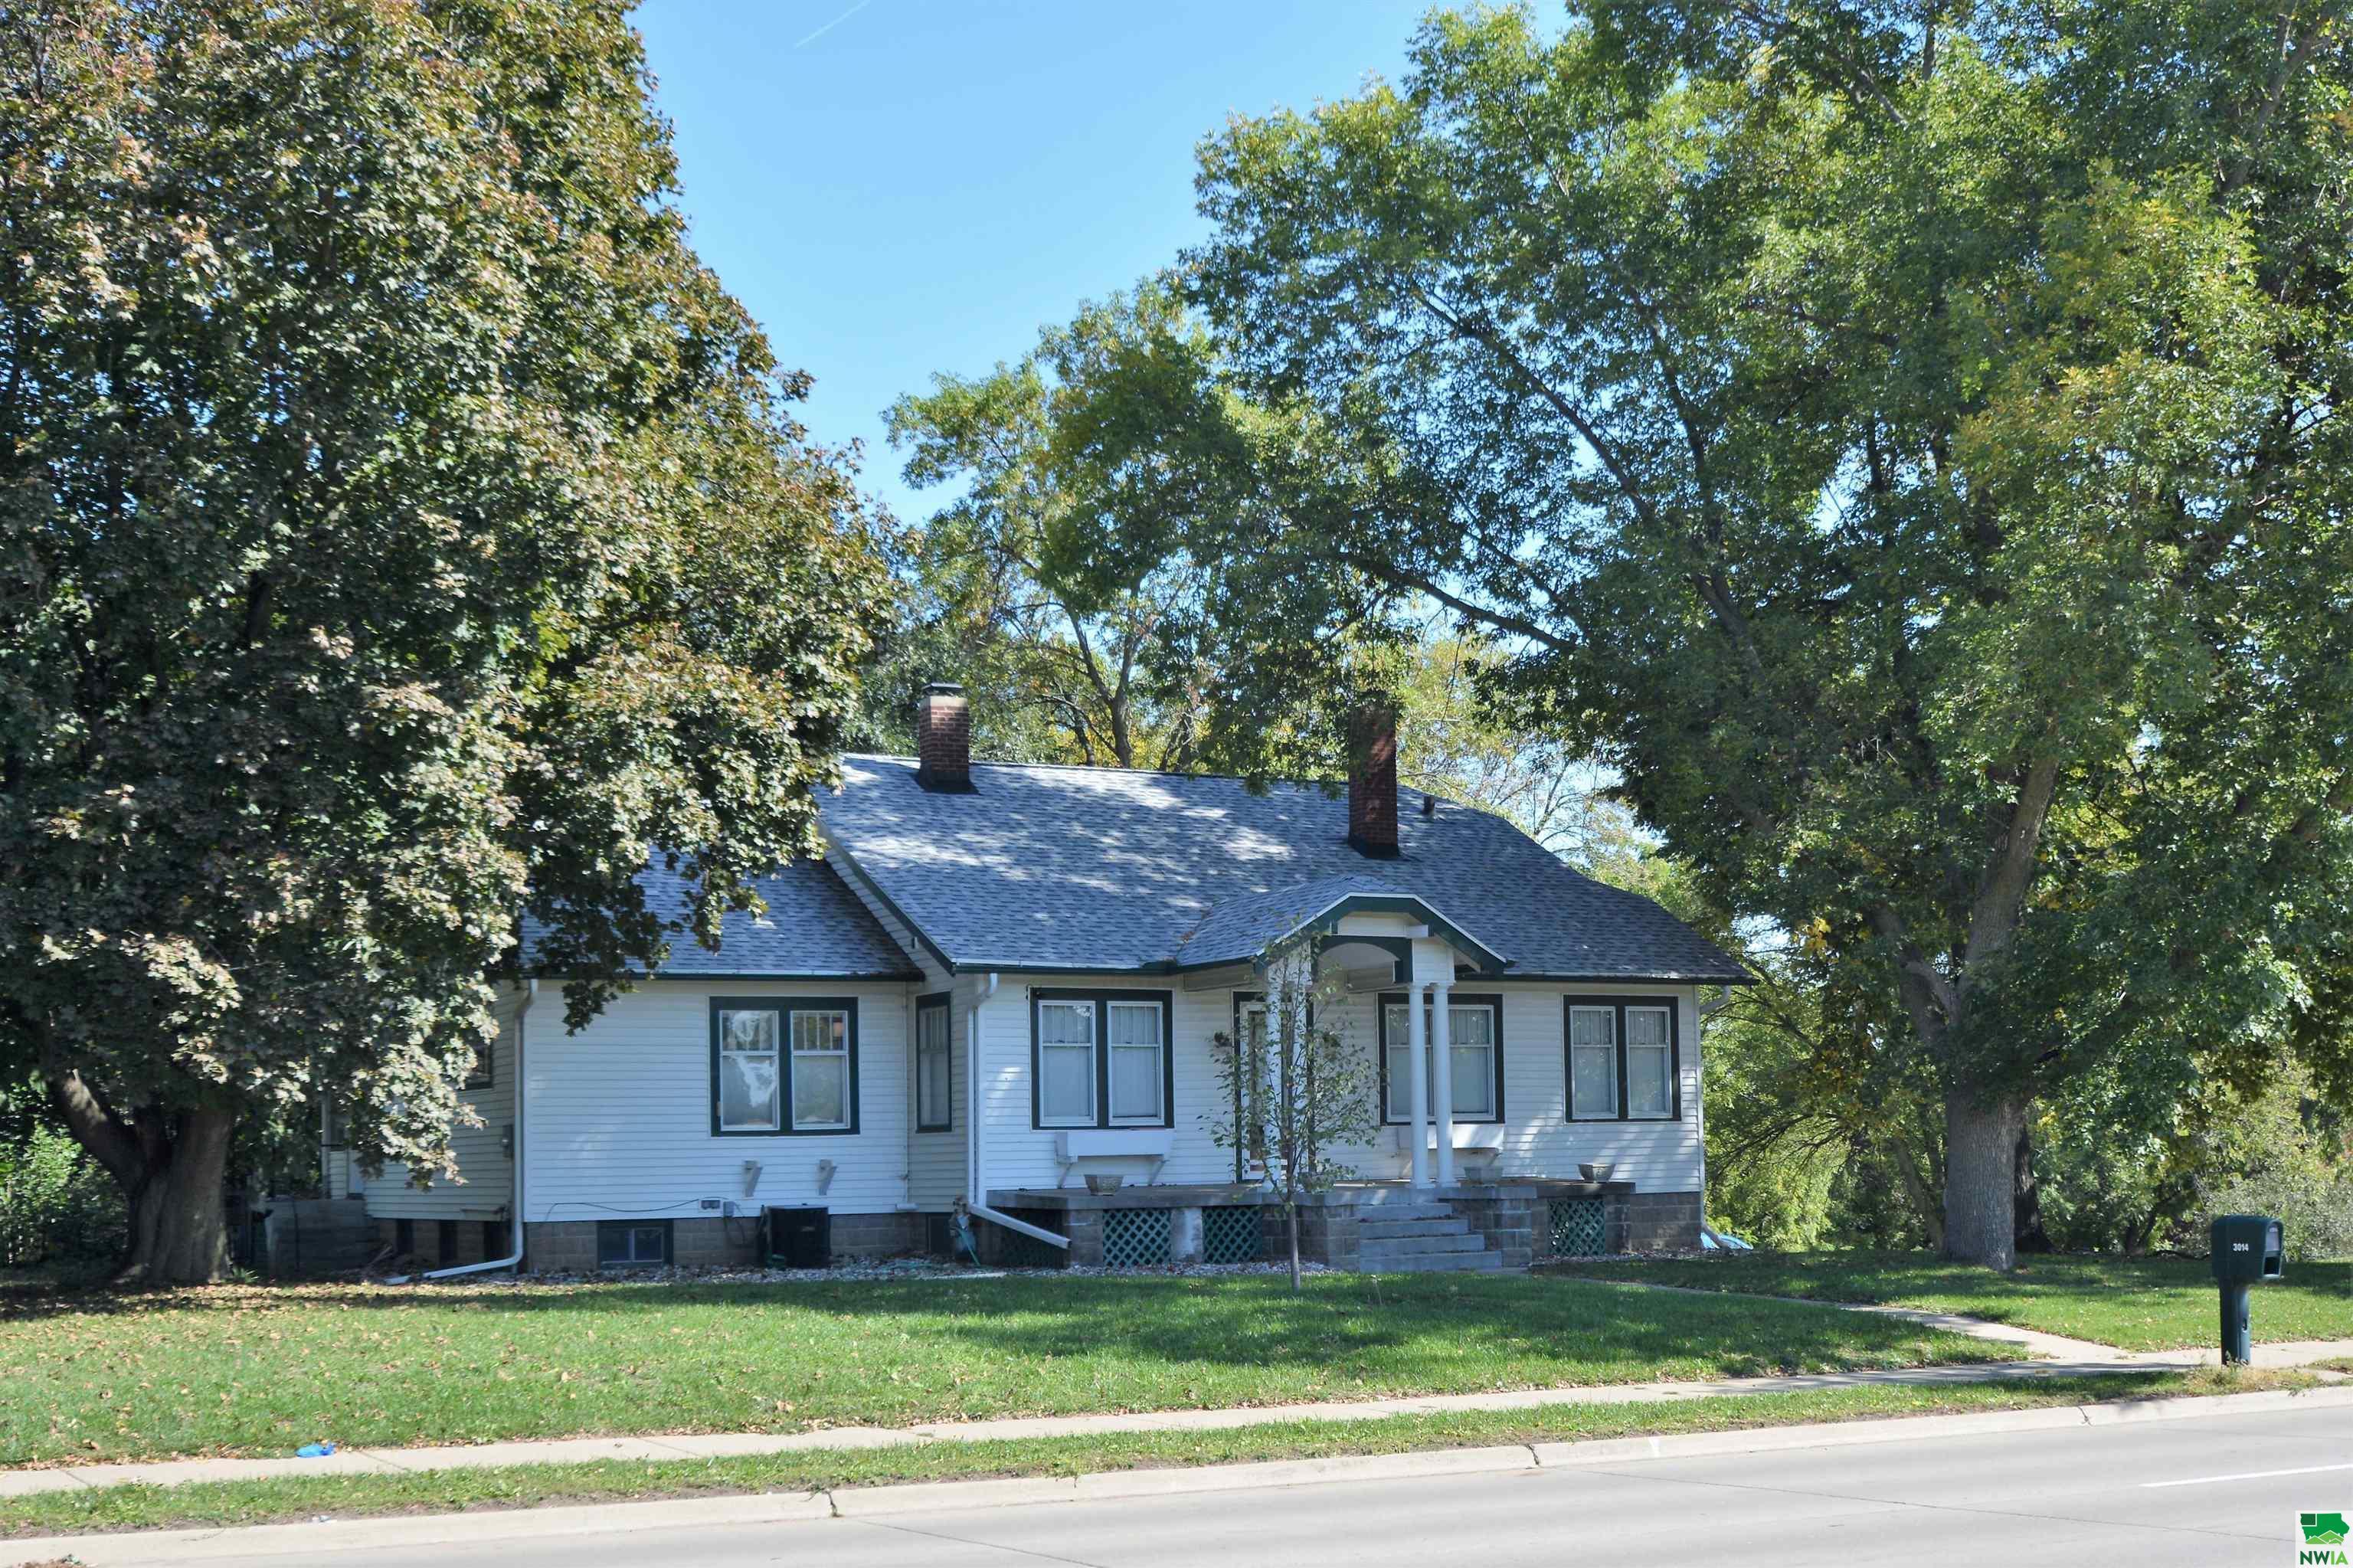 3014 Lakeport St S, Sioux City, Iowa 51106